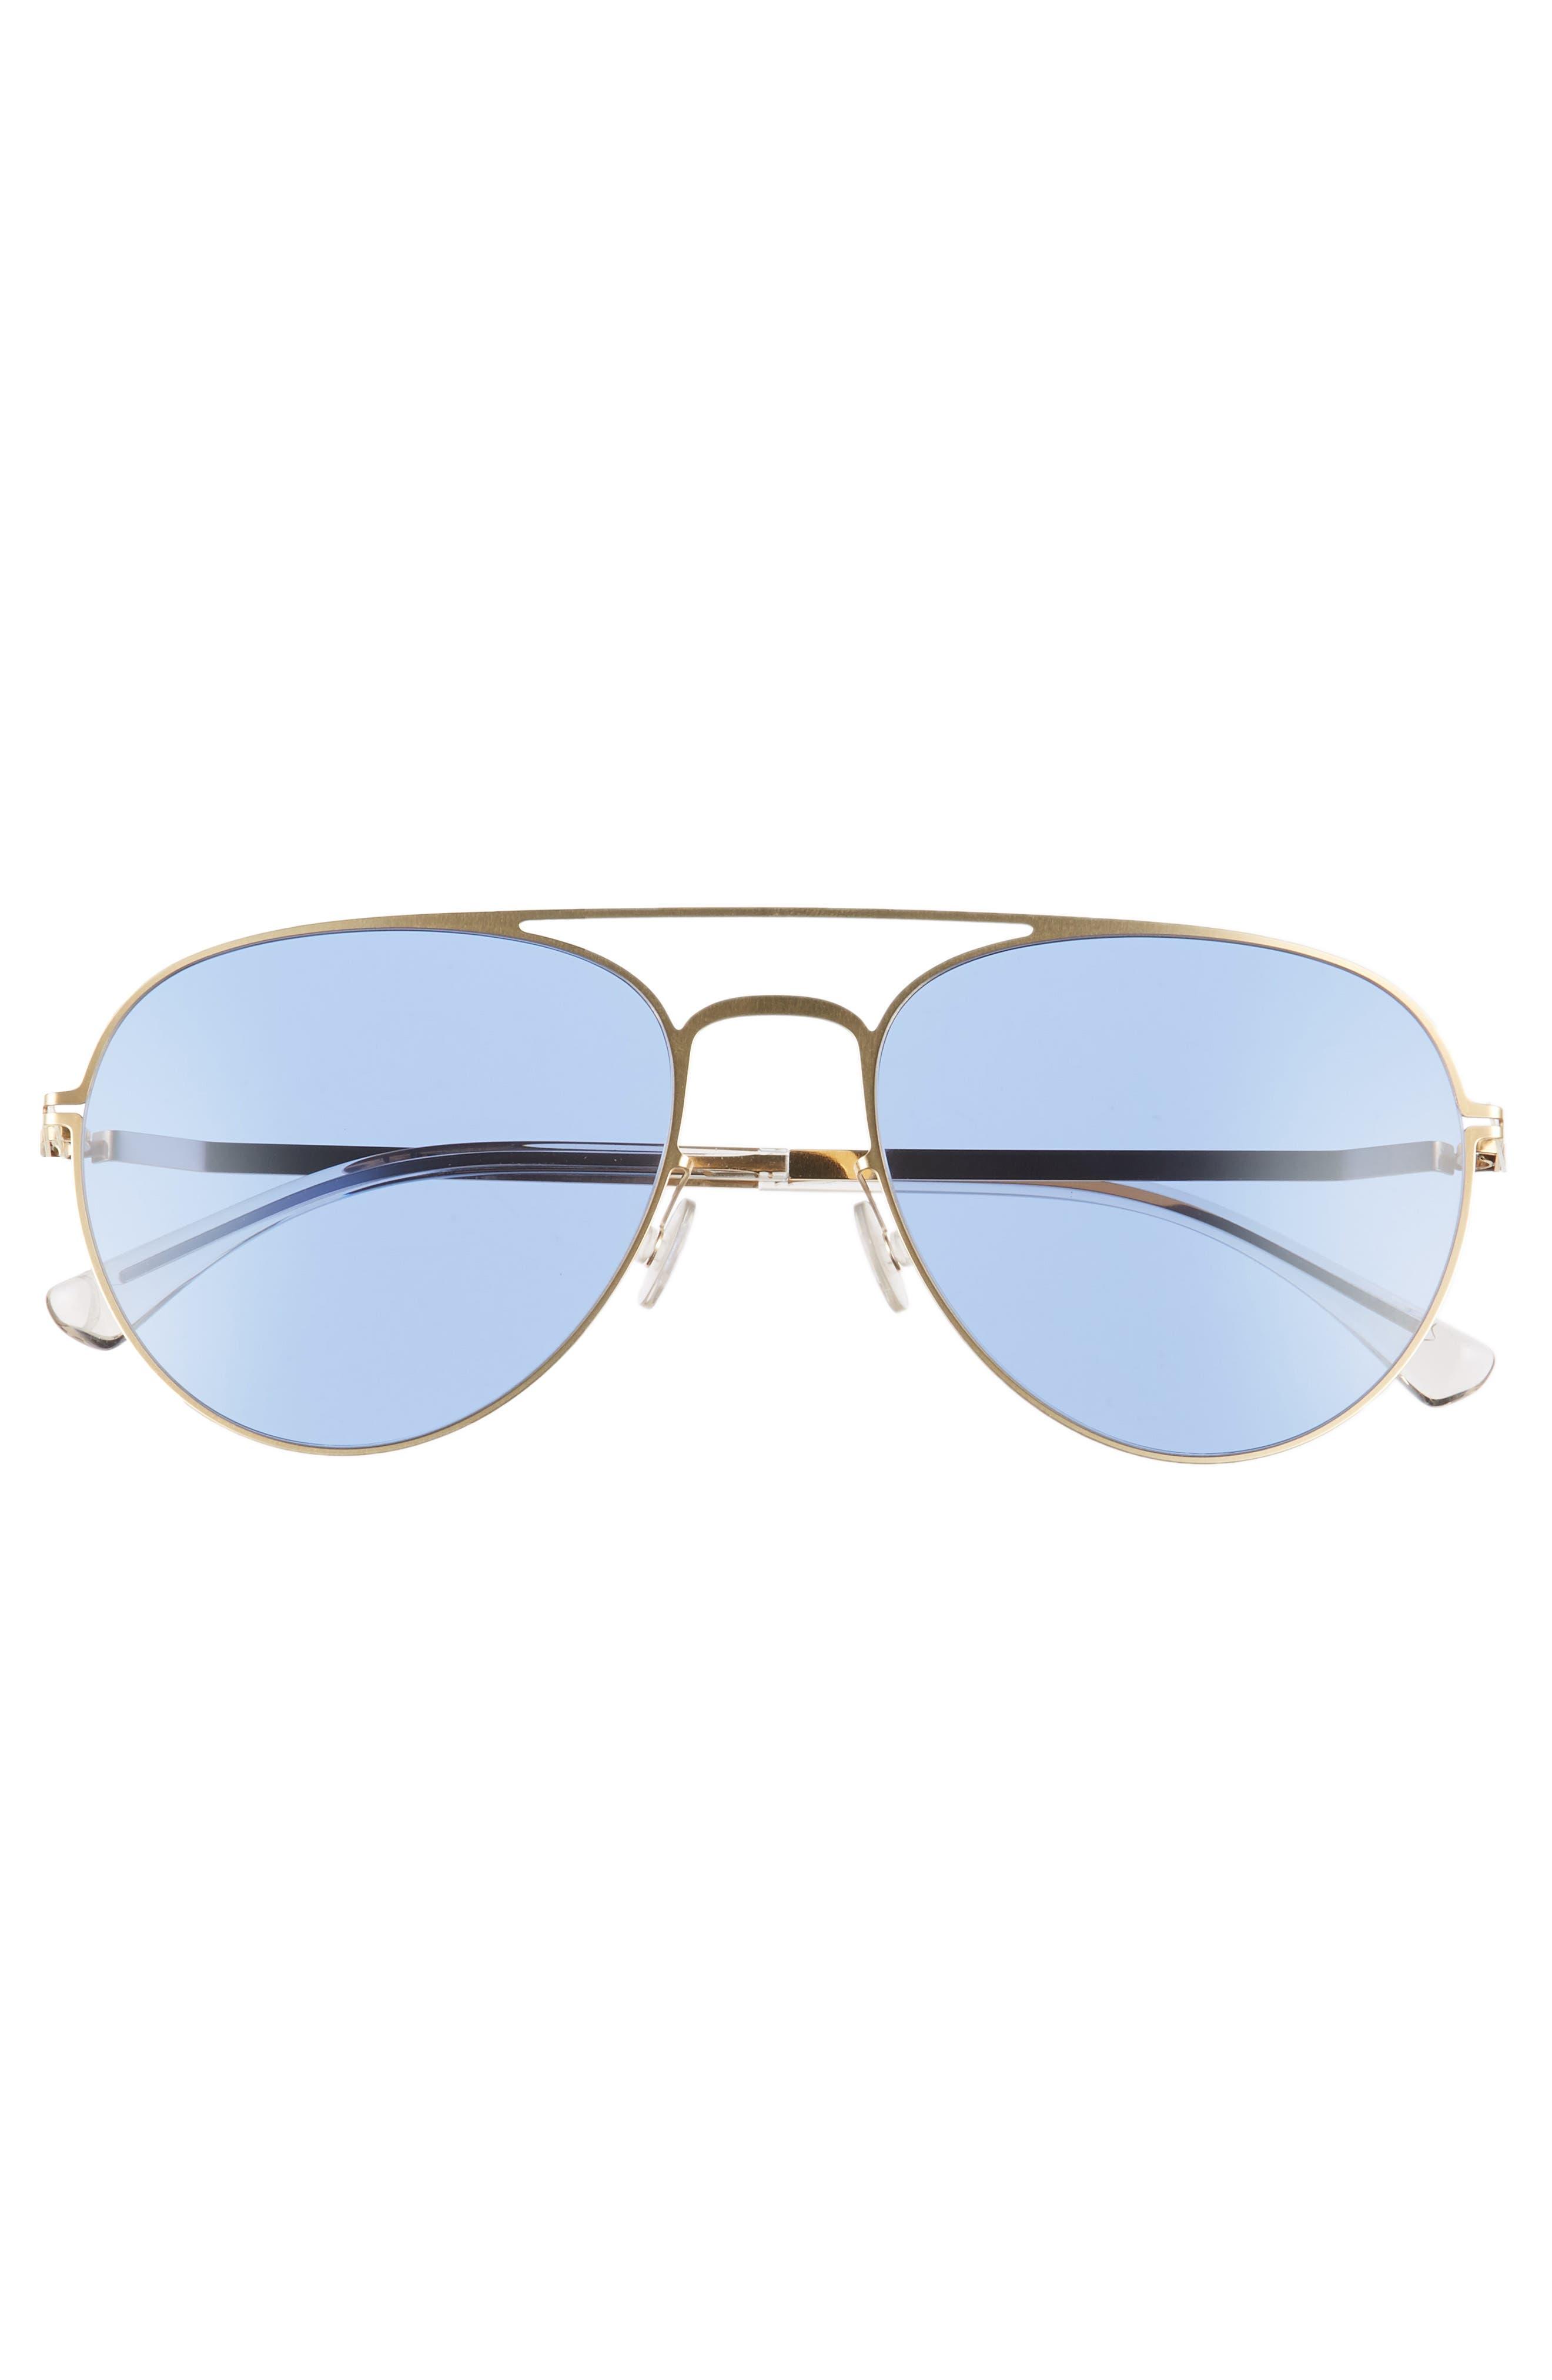 Samu 55mm Aviator Sunglasses,                             Alternate thumbnail 2, color,                             Glossy Gold